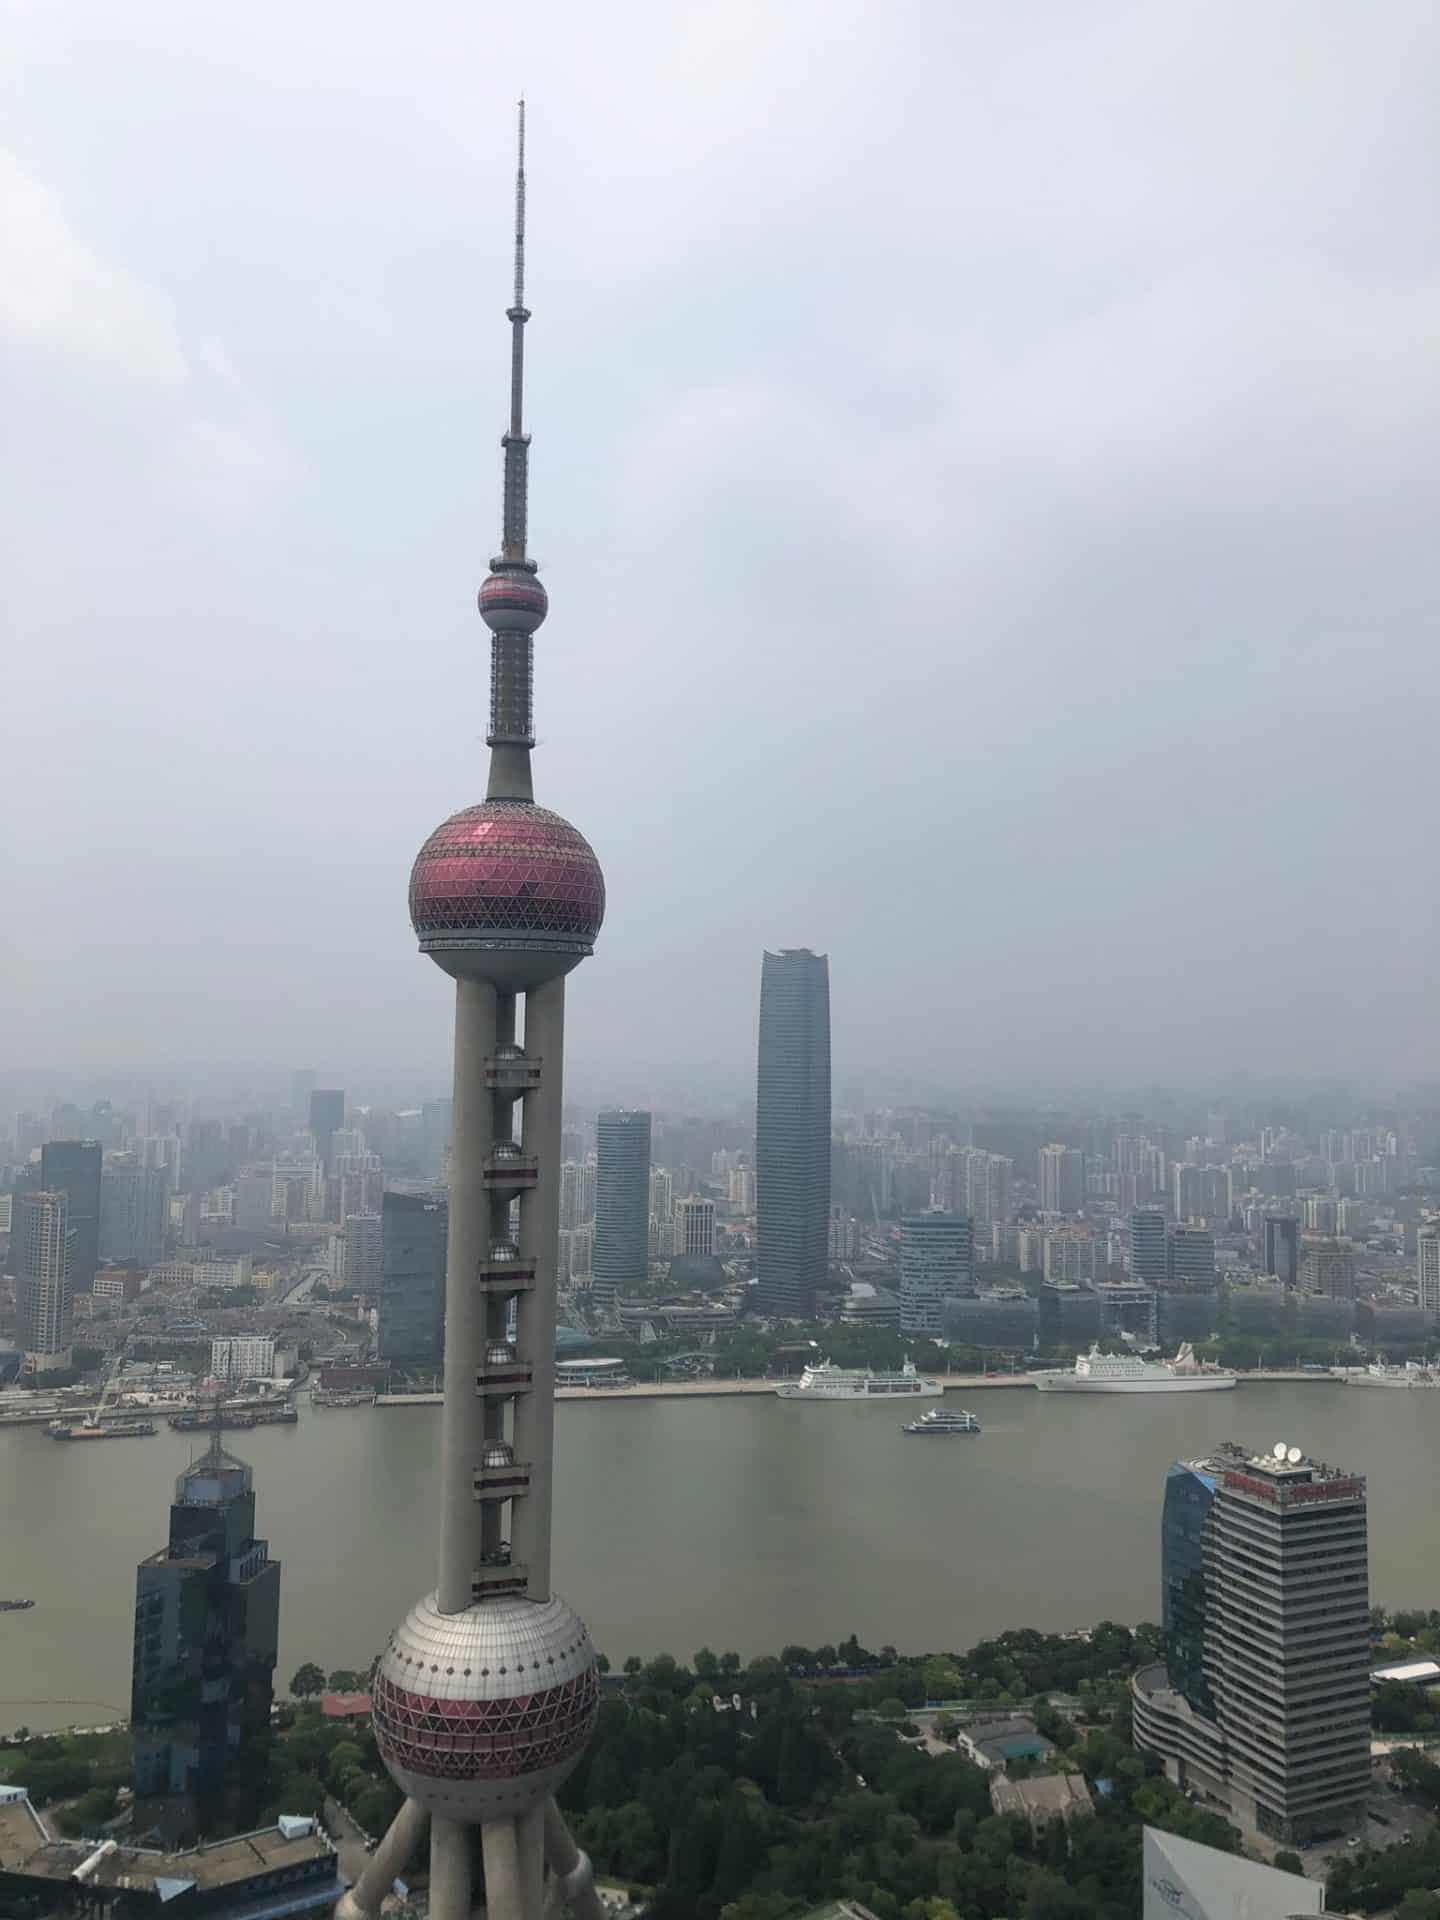 Pearl Towerfrom The Ritz-Carlton Shanghai, 5-stjernes hotell